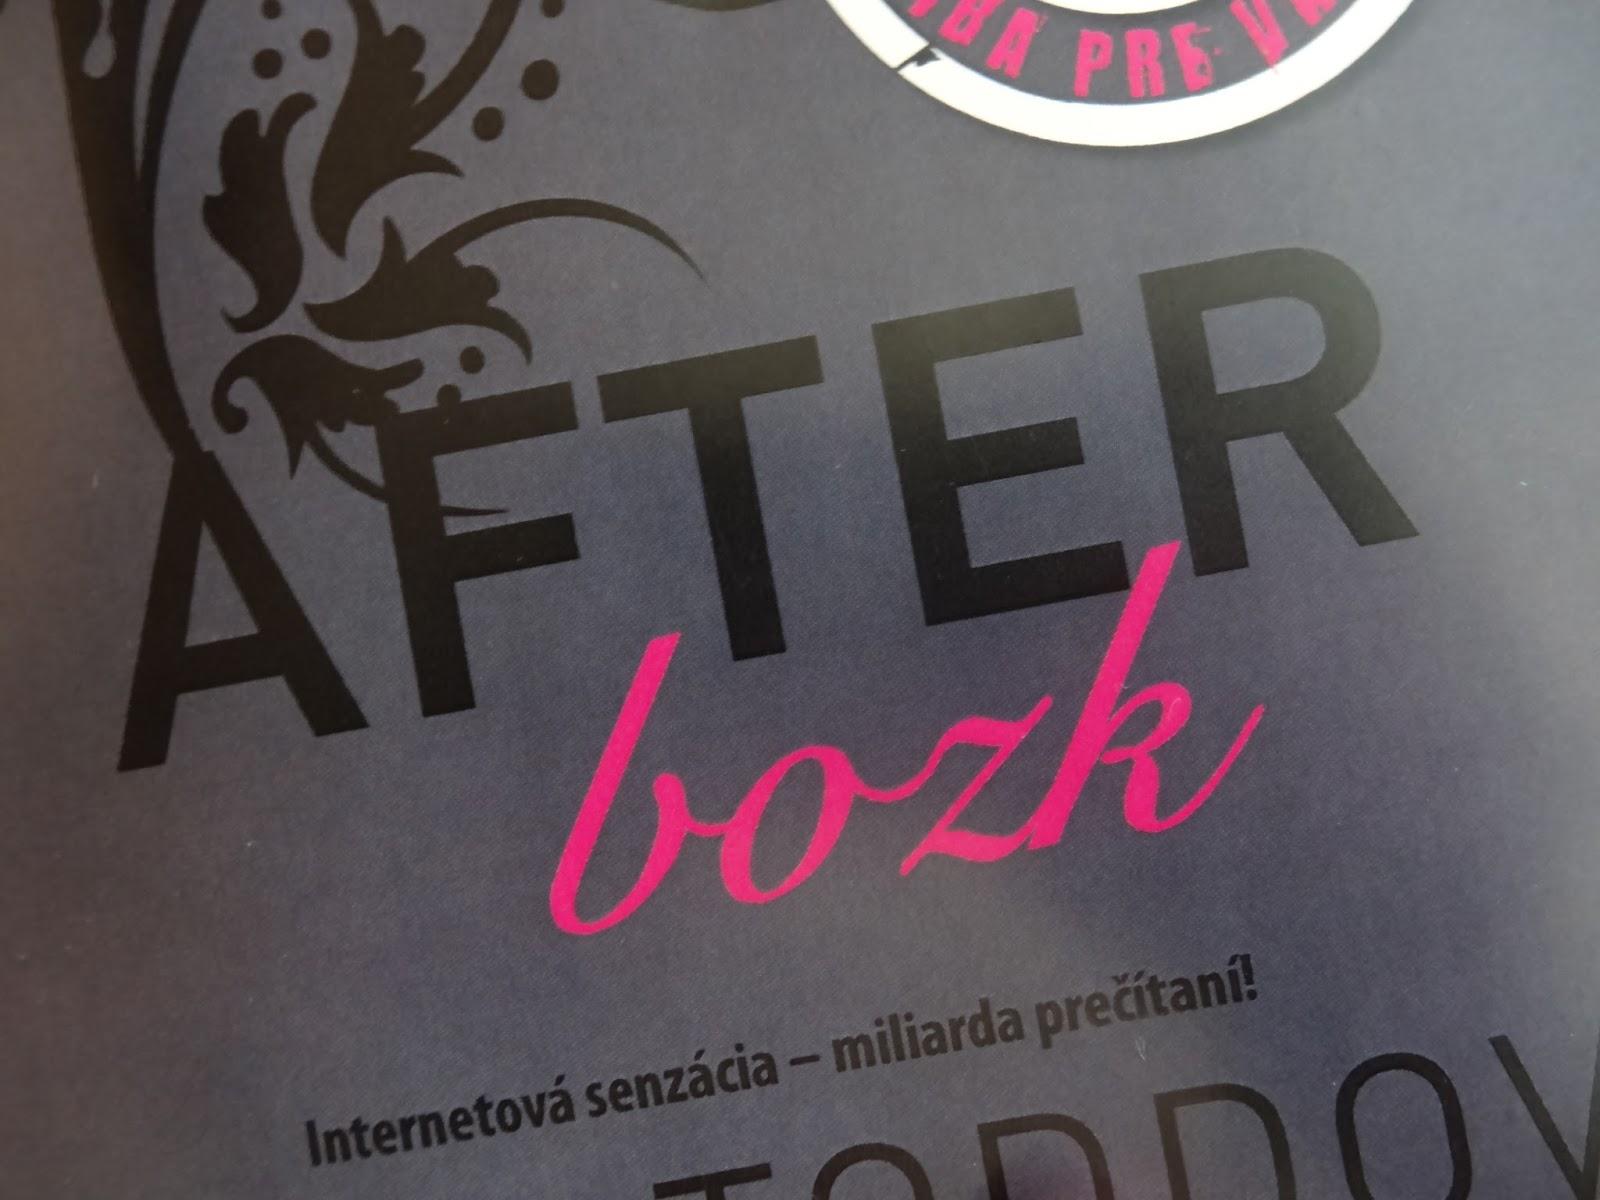 e72329150 Paperback: After – Bozk (Anna Toddová)   bux.sk